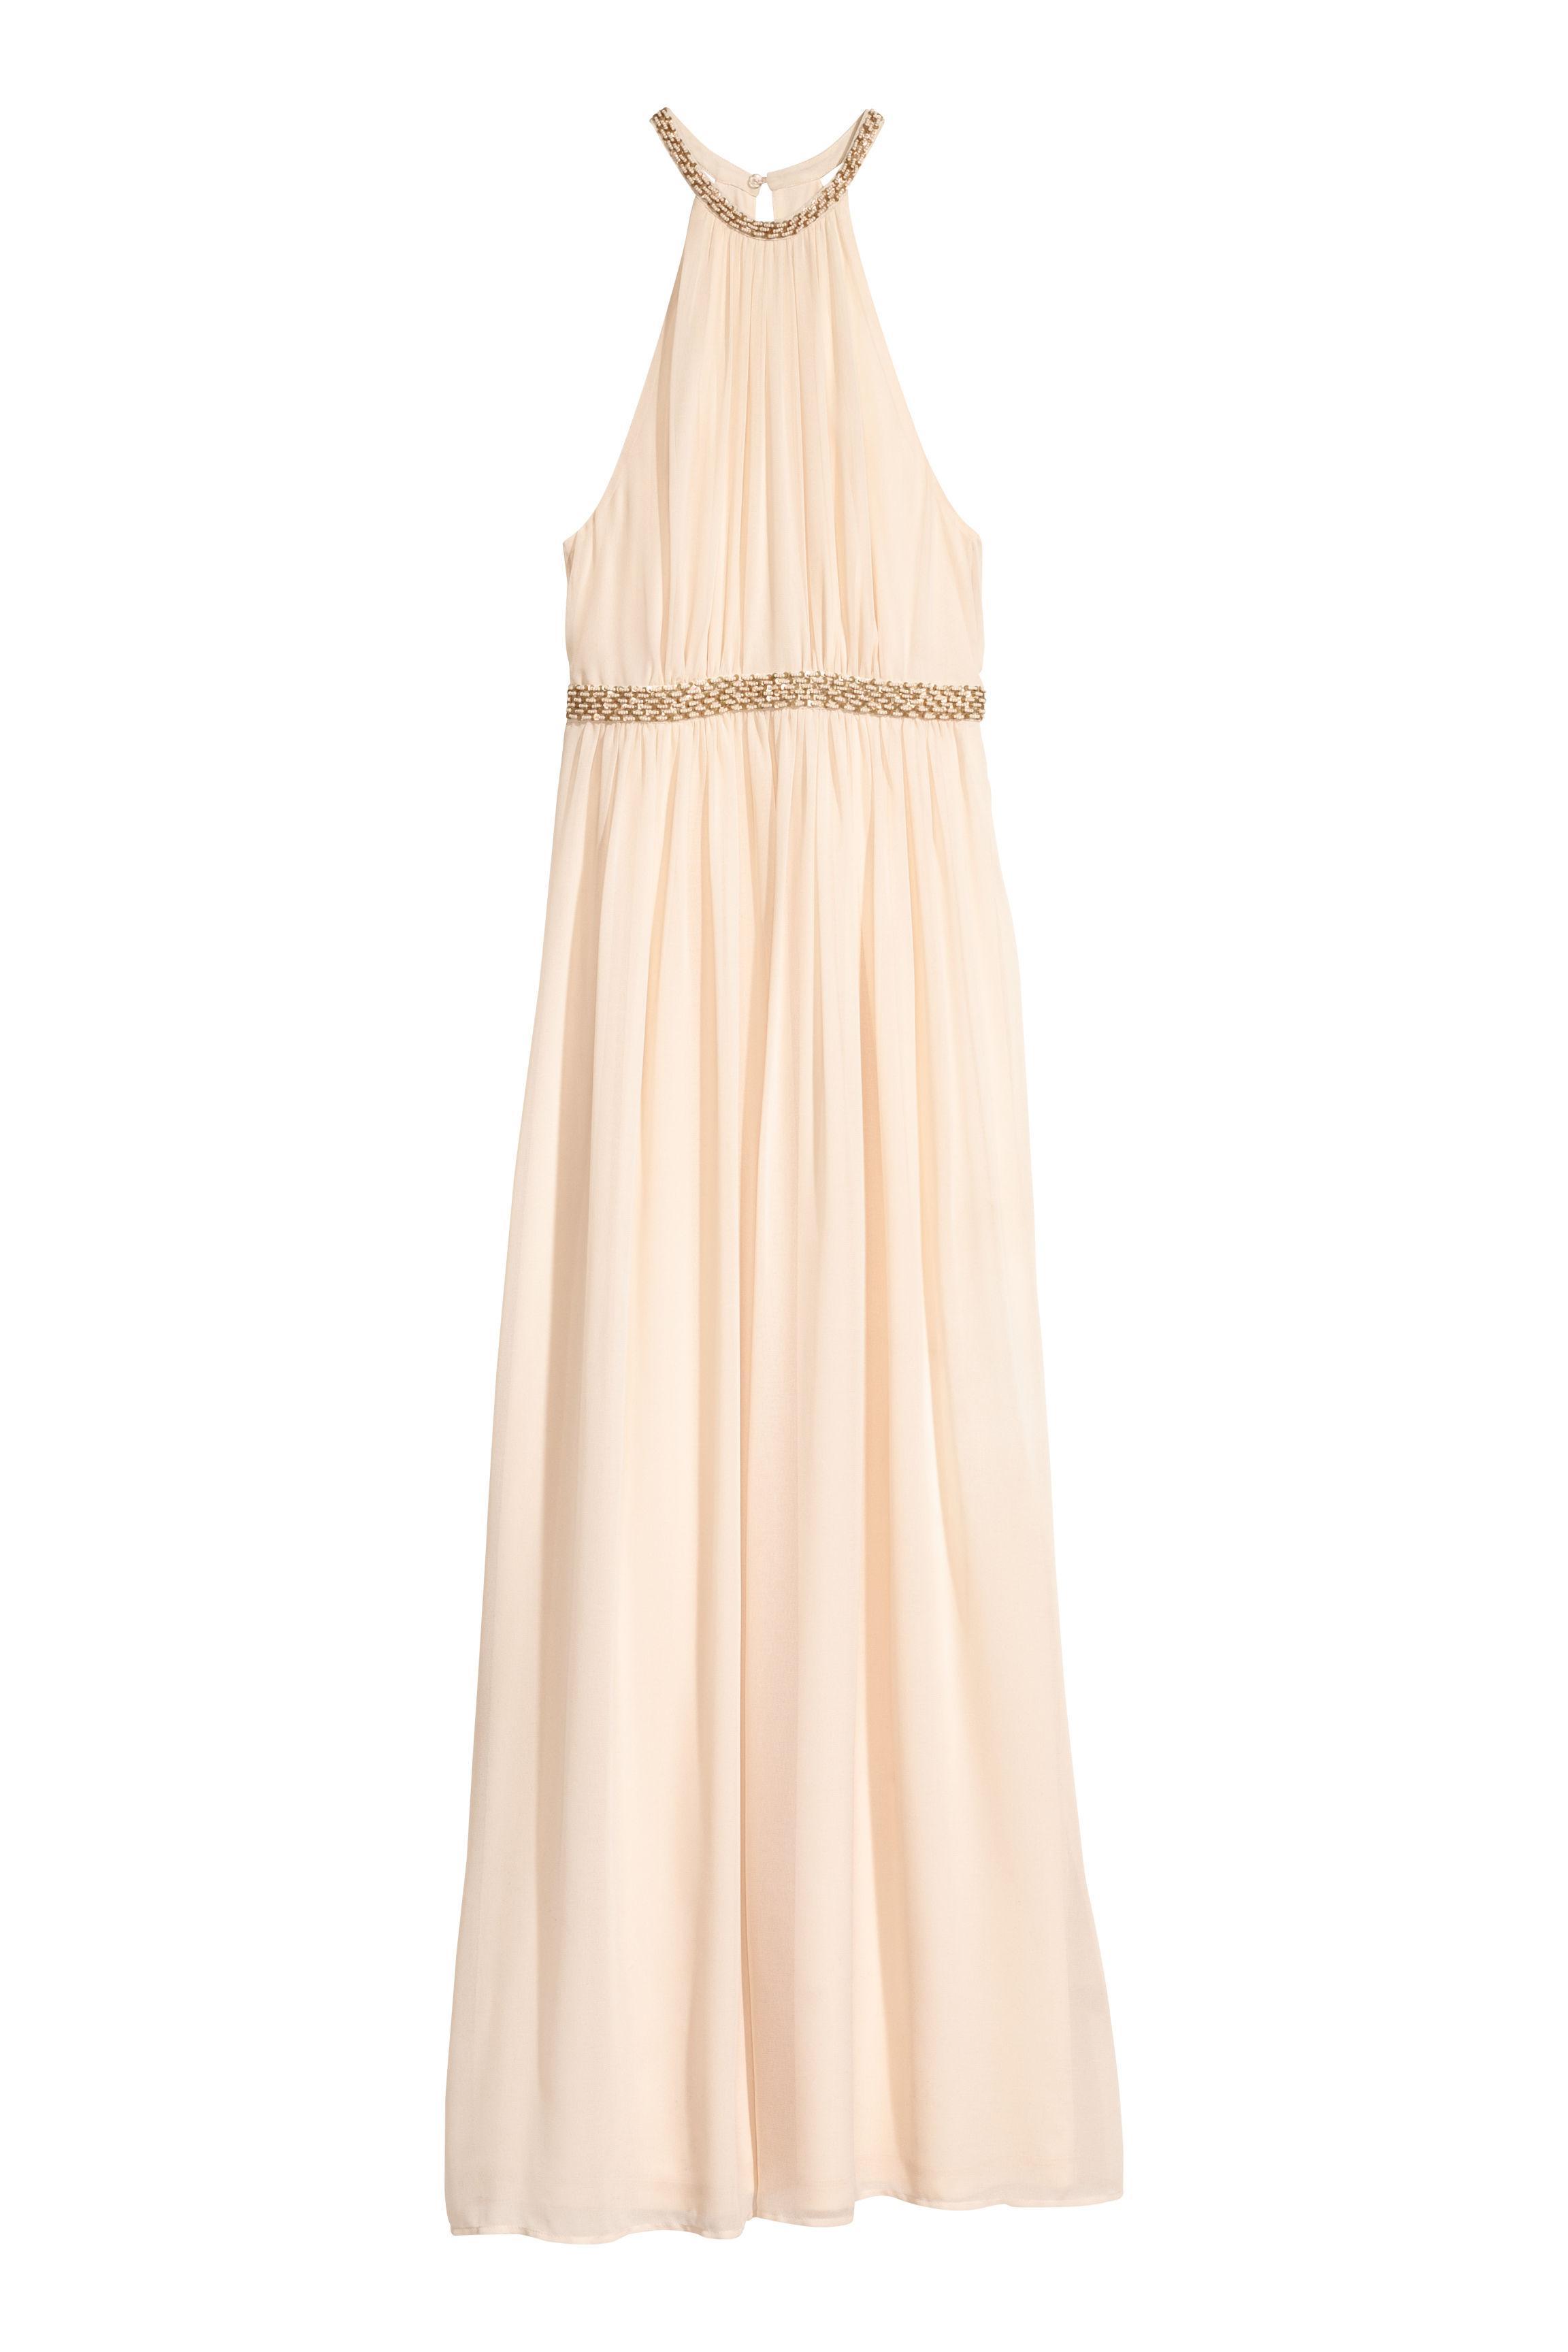 5049a0430647e H&M Long Chiffon Dress in Natural - Lyst